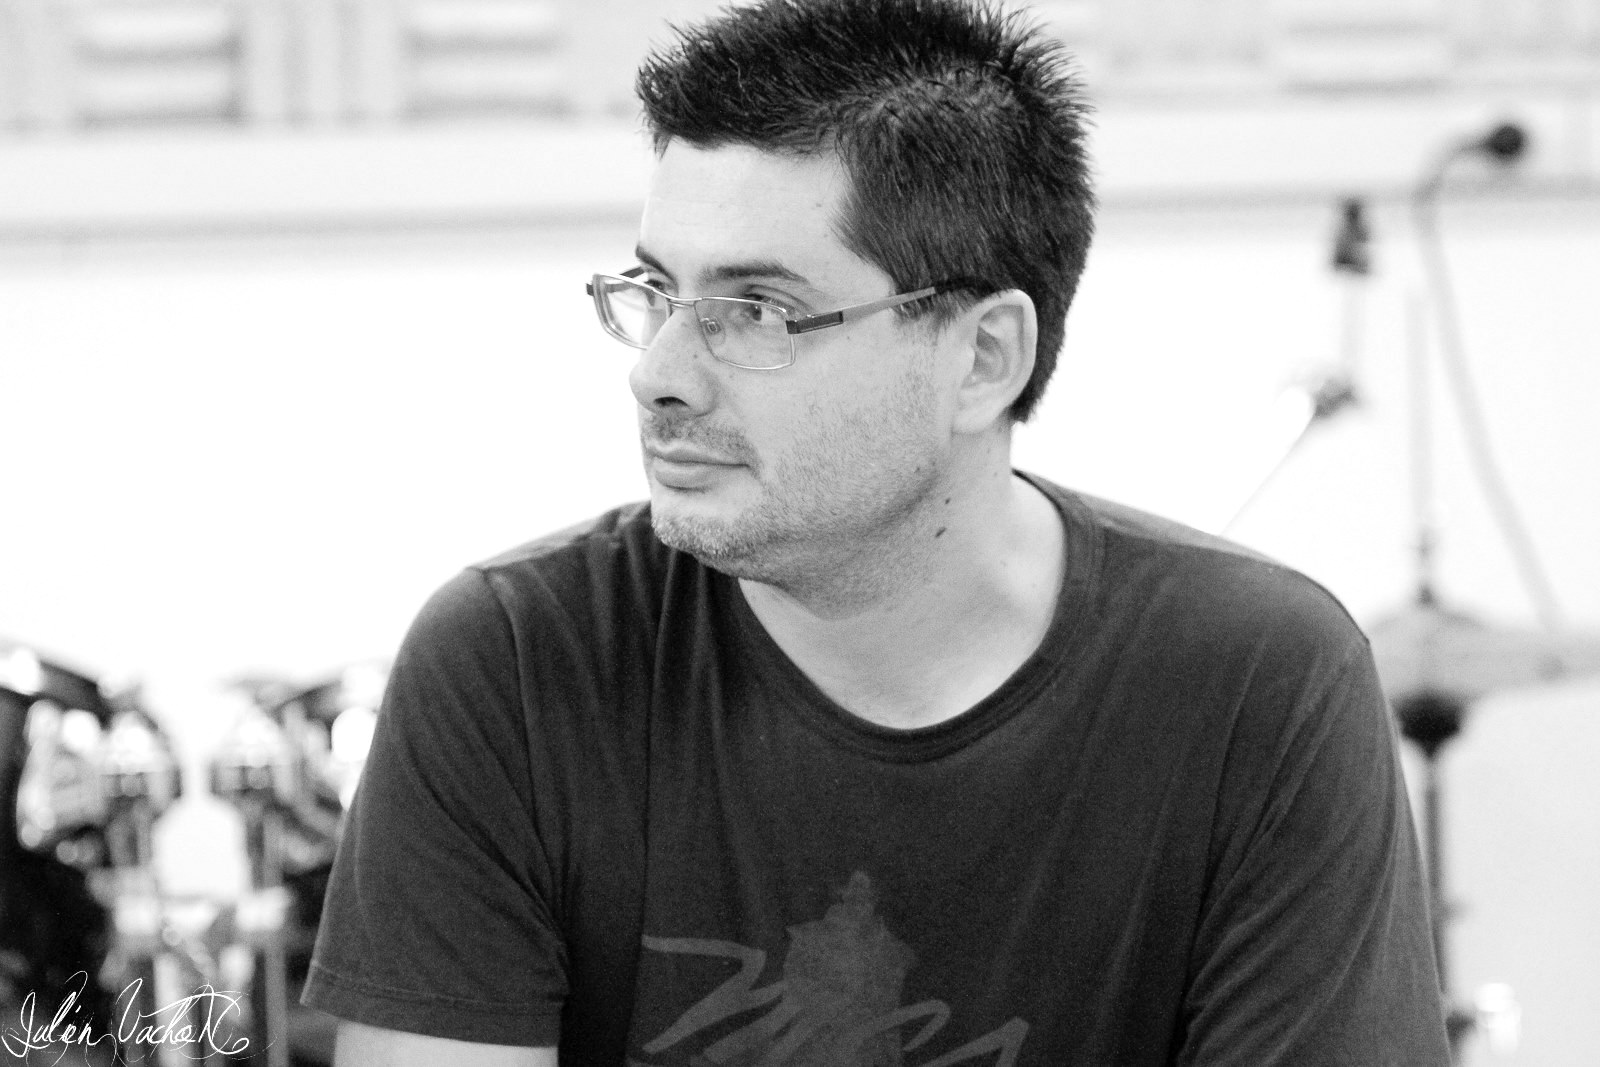 Jean-Philippe Boisson – Abbey Road Institute France